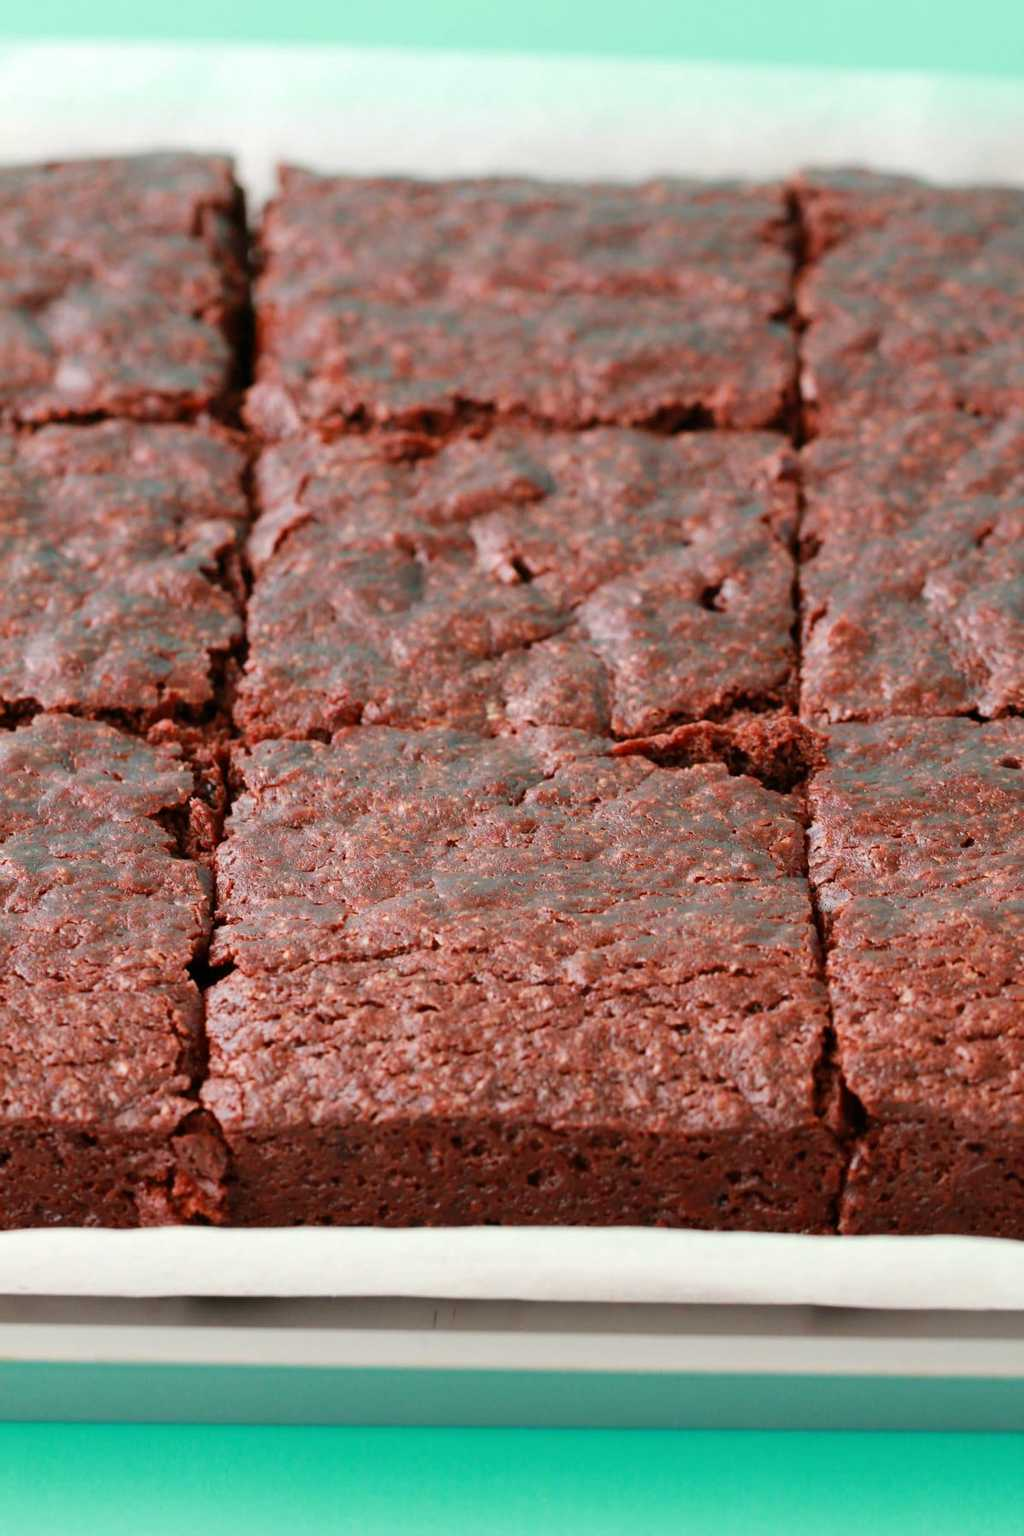 Freshly baked and sliced tray of vegan brownies.